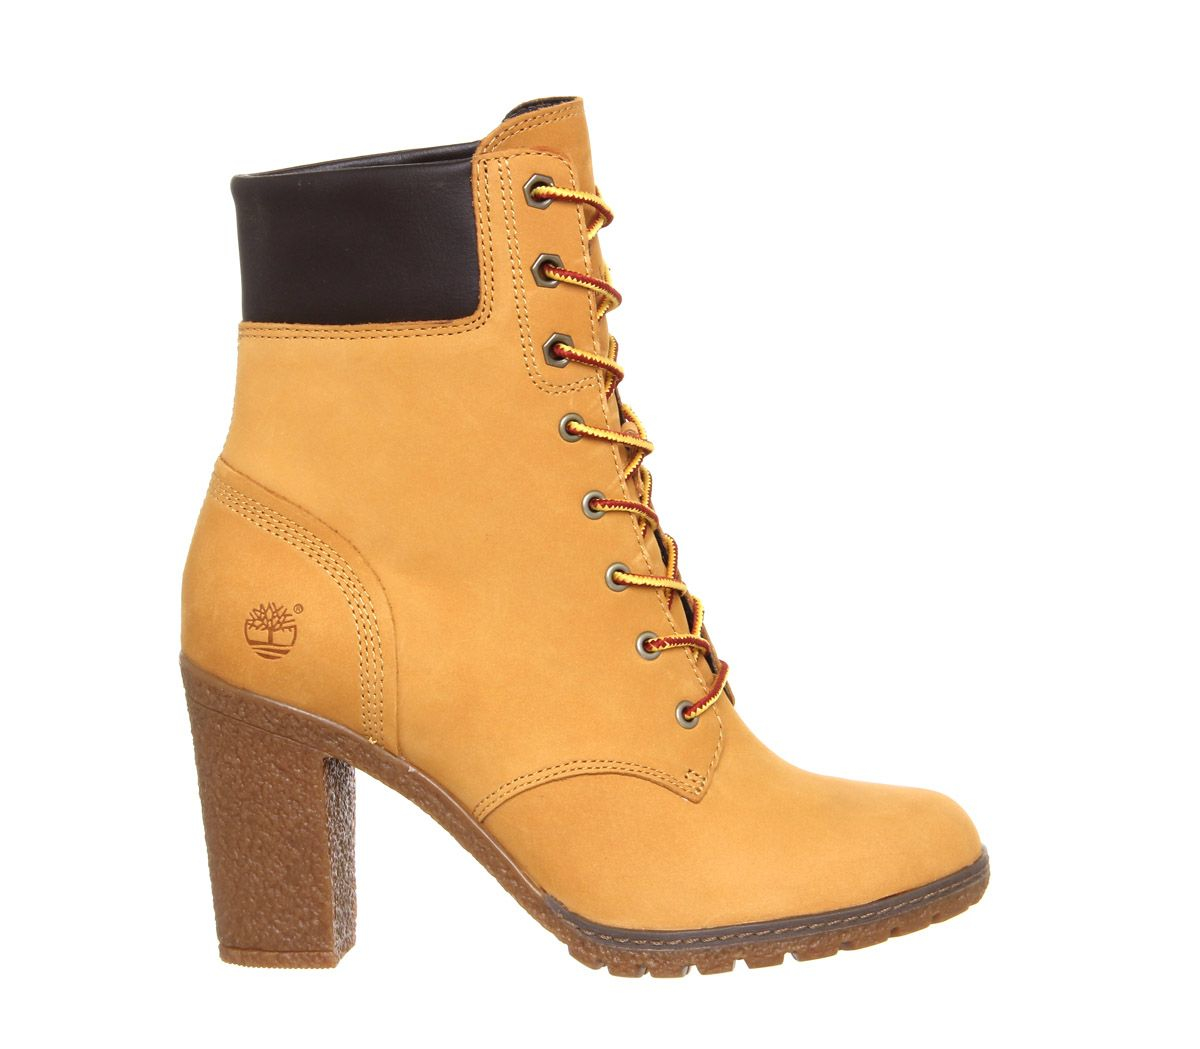 timberland-tan-glancy-6-inch-heel-boots-